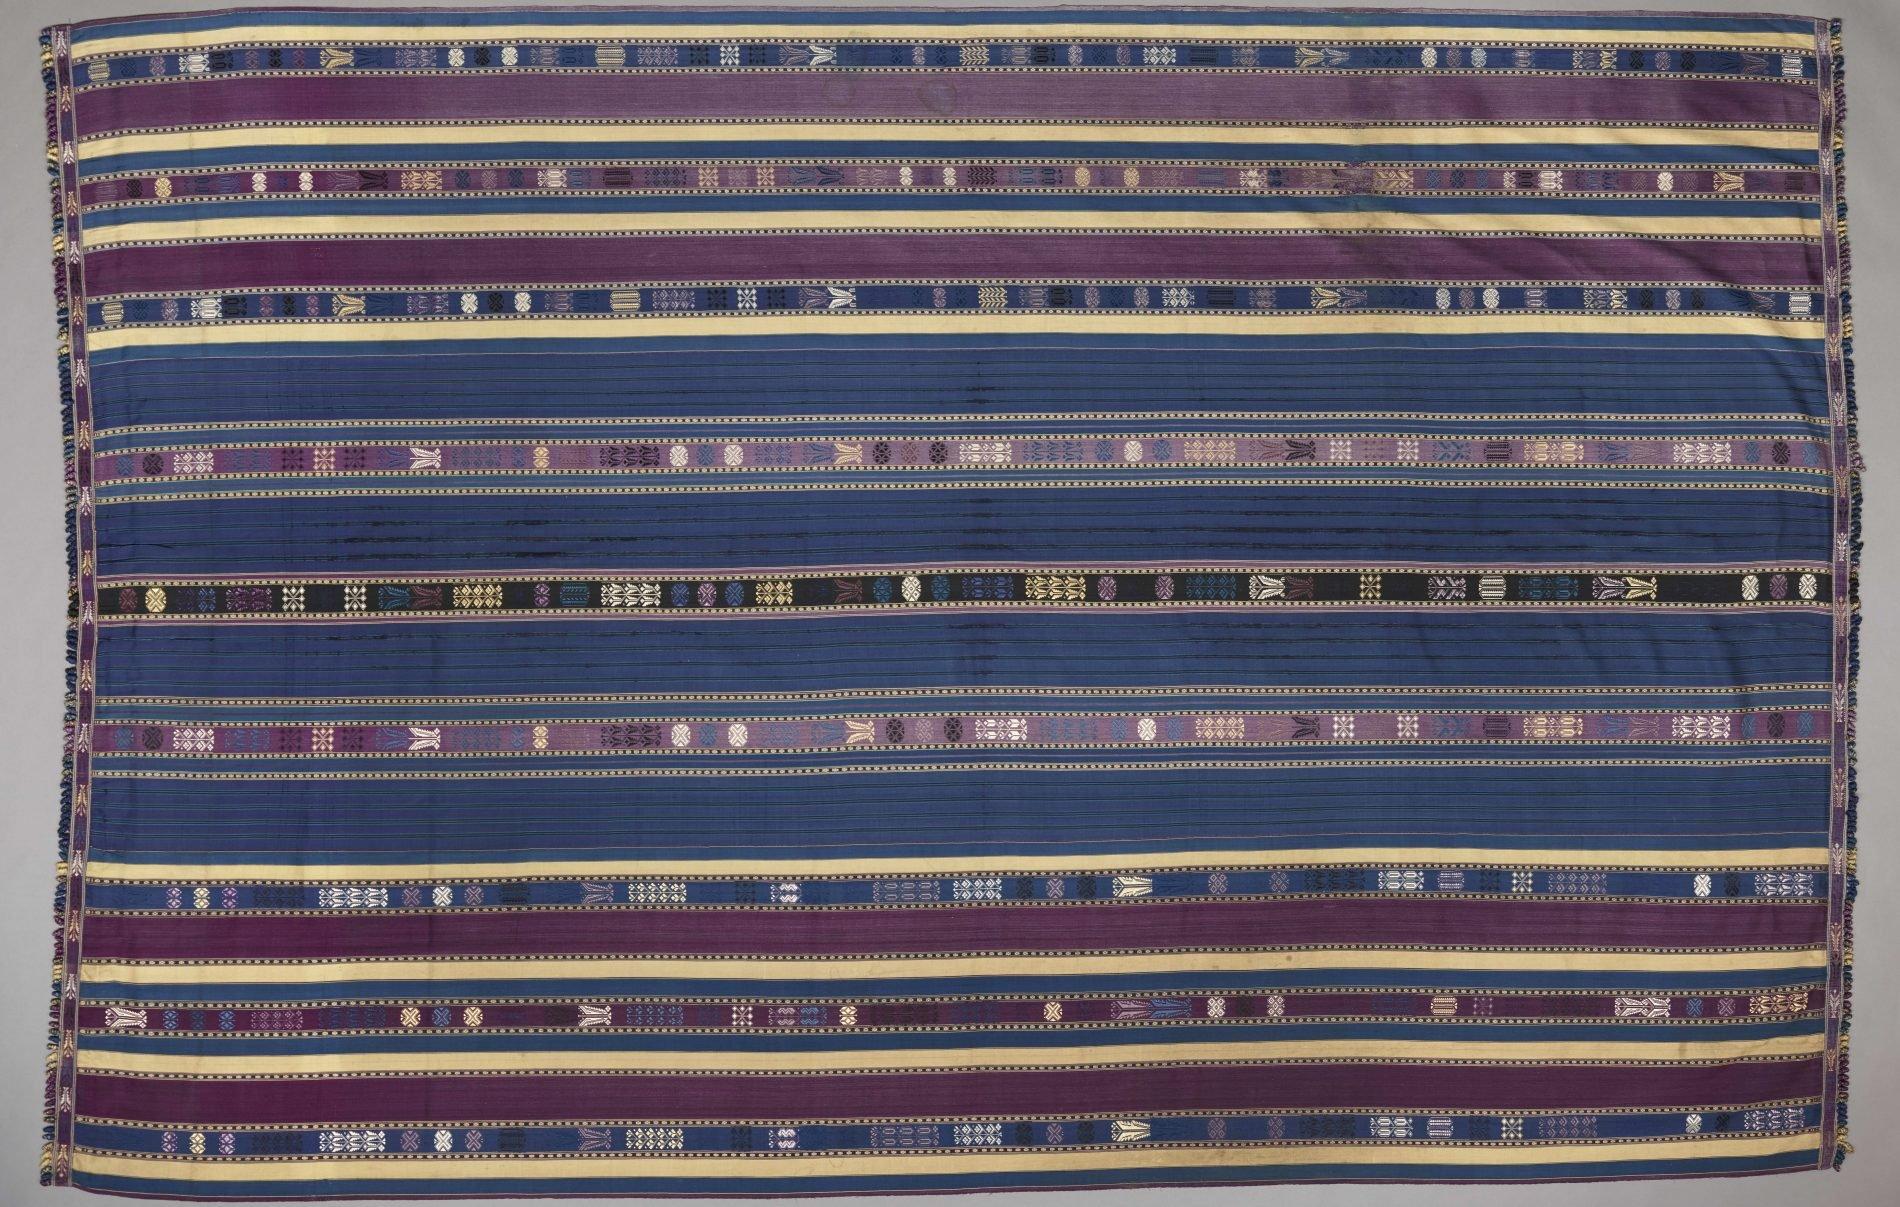 Lamba akotifahana, Madagascar, Malagasy peoples, Merino group, mid- to late 19th century, silk, Dallas Museum of Art, Textile Purchase Fund, 2019.75.